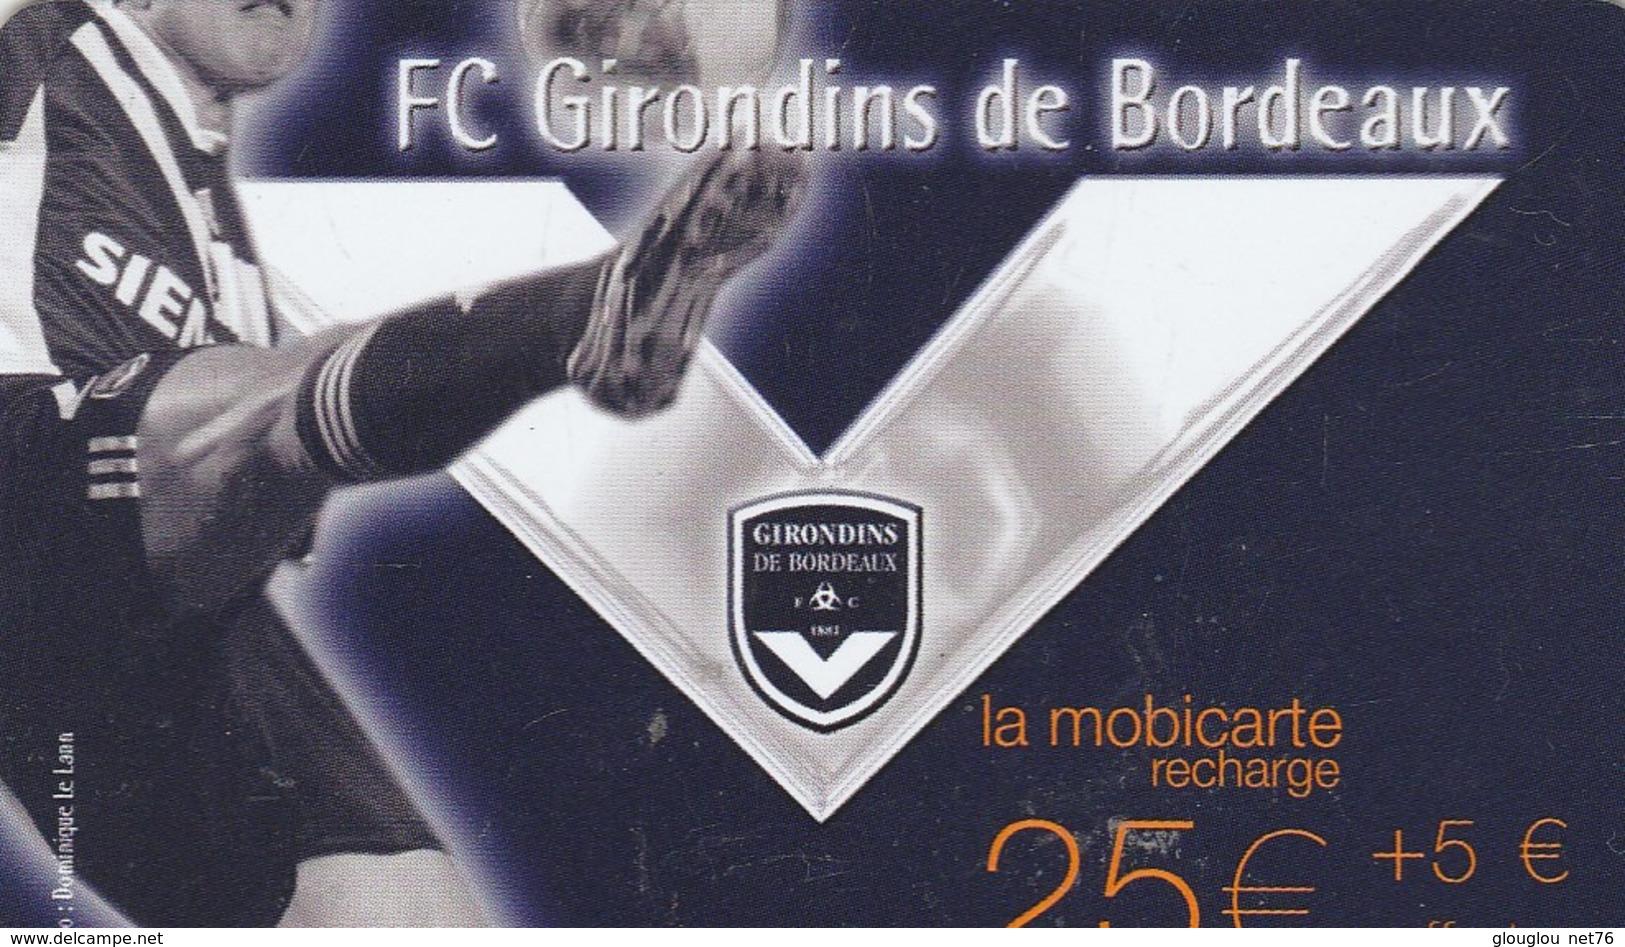 MOBICARTE..25E + 5E OFFERTS...FC GIRONDINS DE BORDEAUX   OL....TIRAGE 48 000 EX - France